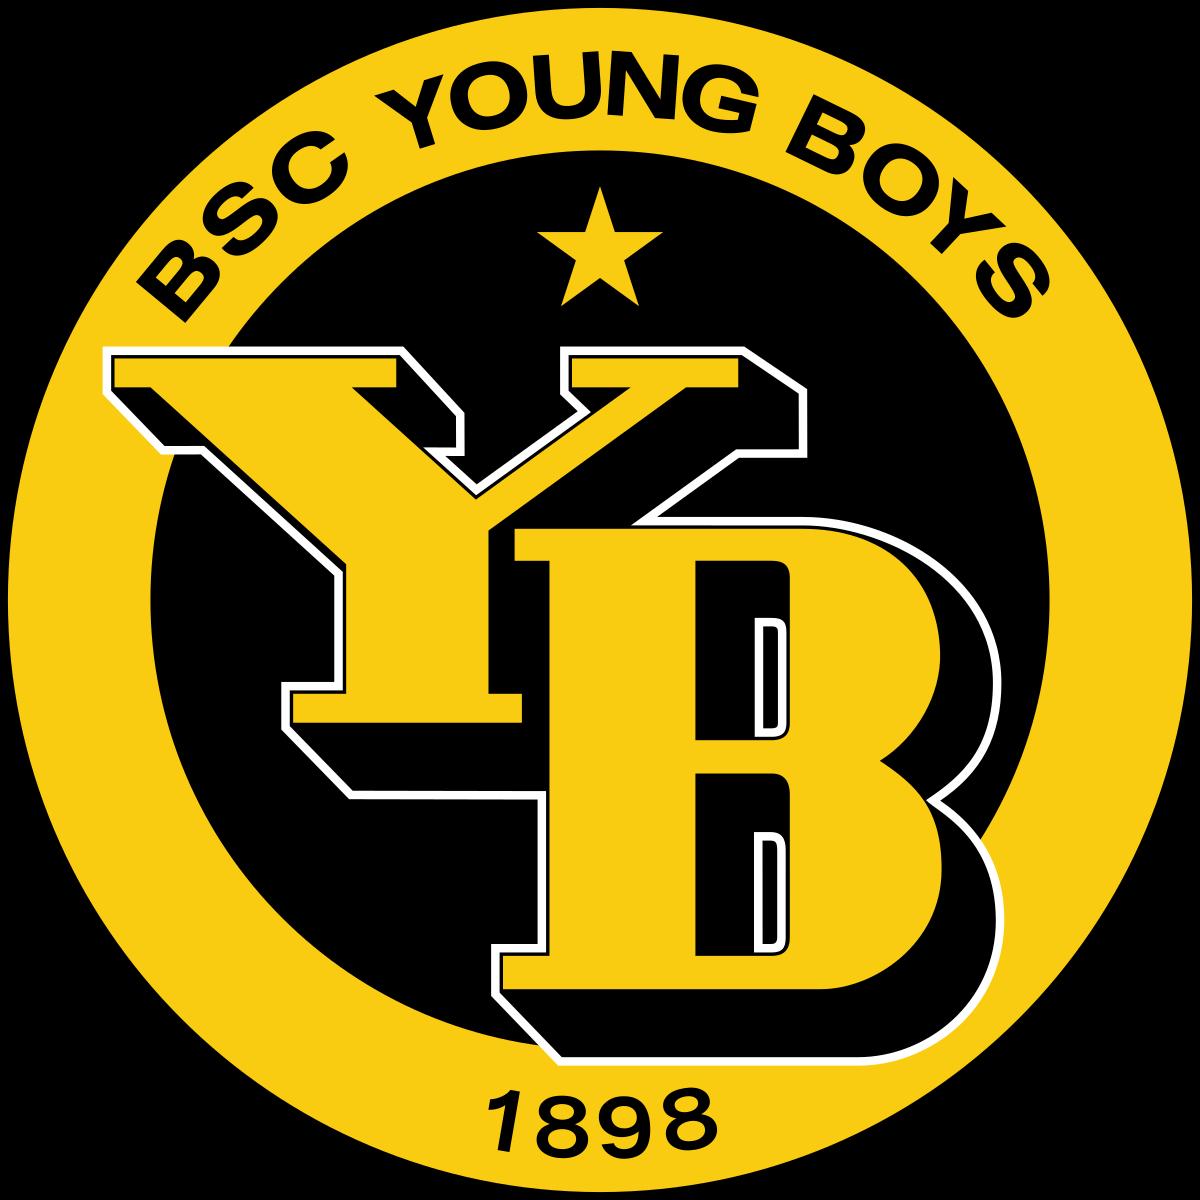 Young Boys Berceni